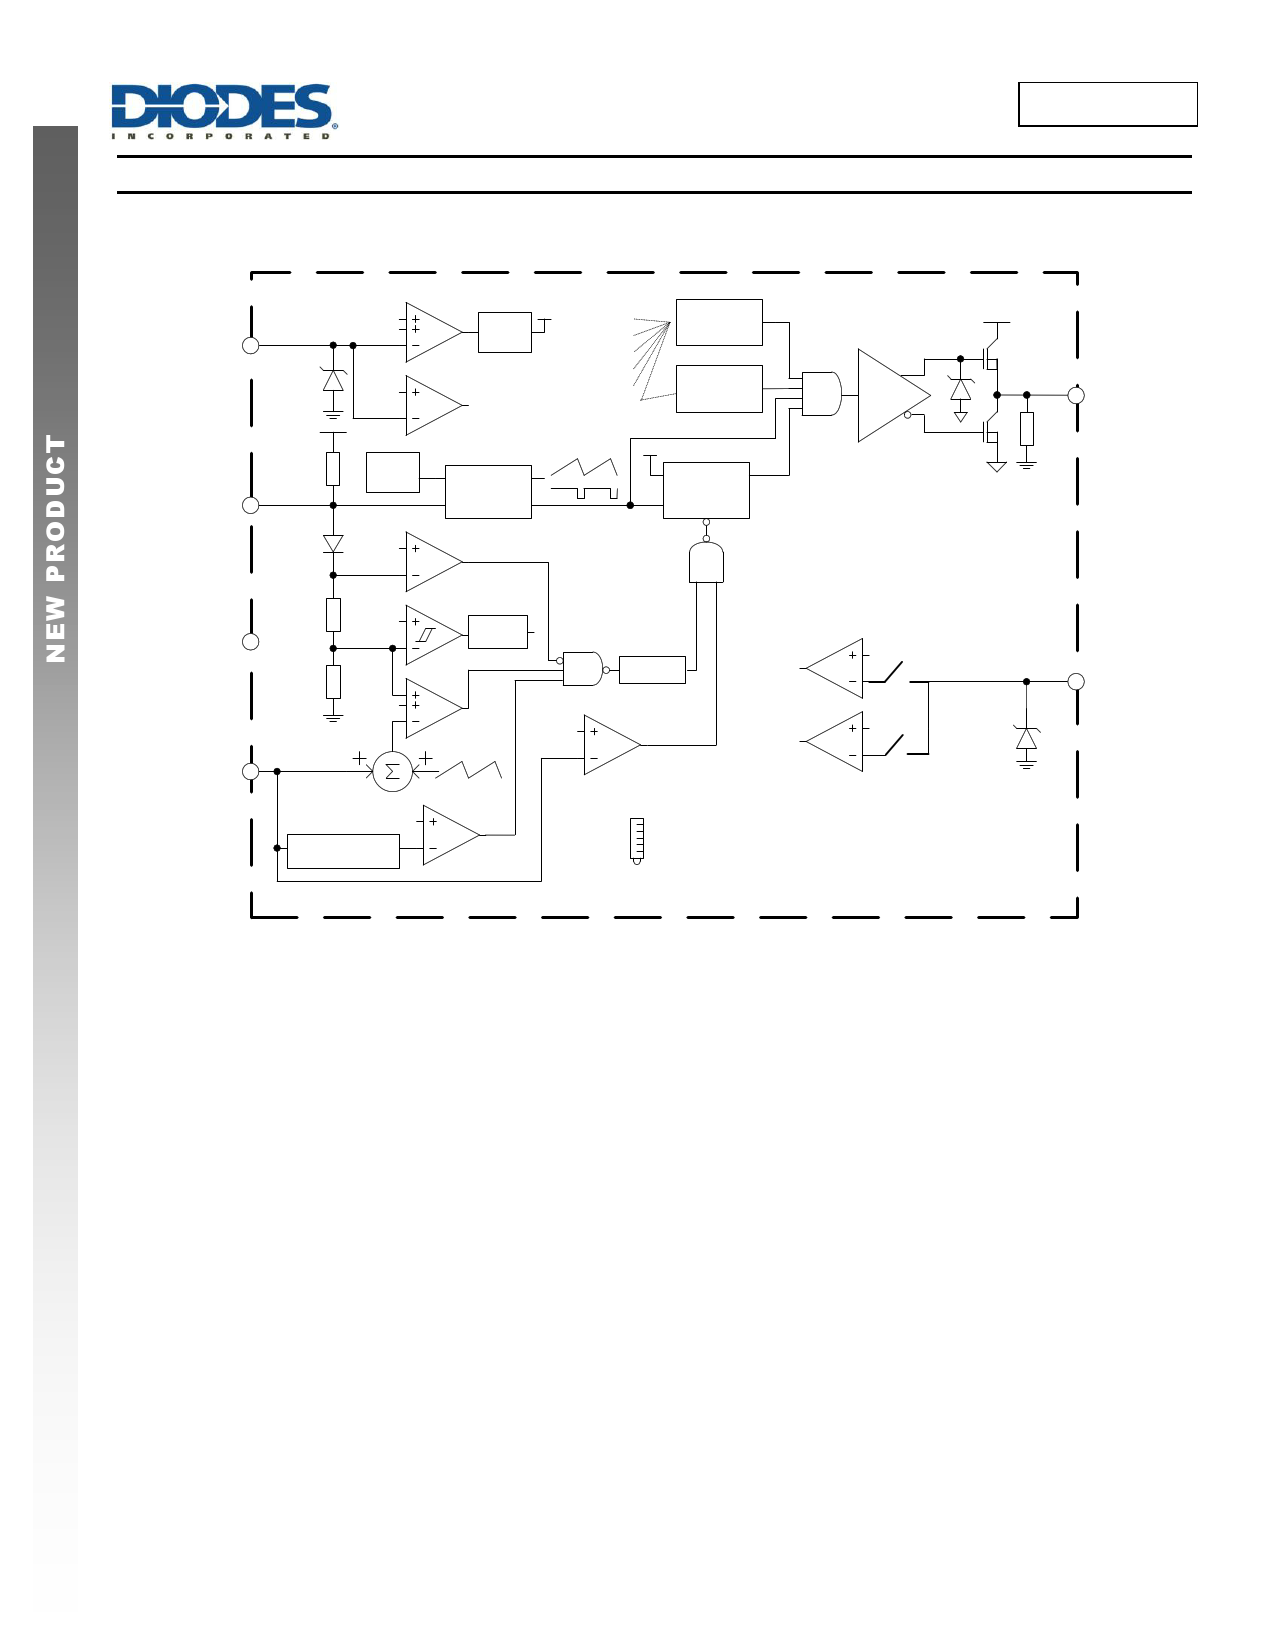 AP3127H pdf, 電子部品, 半導体, ピン配列